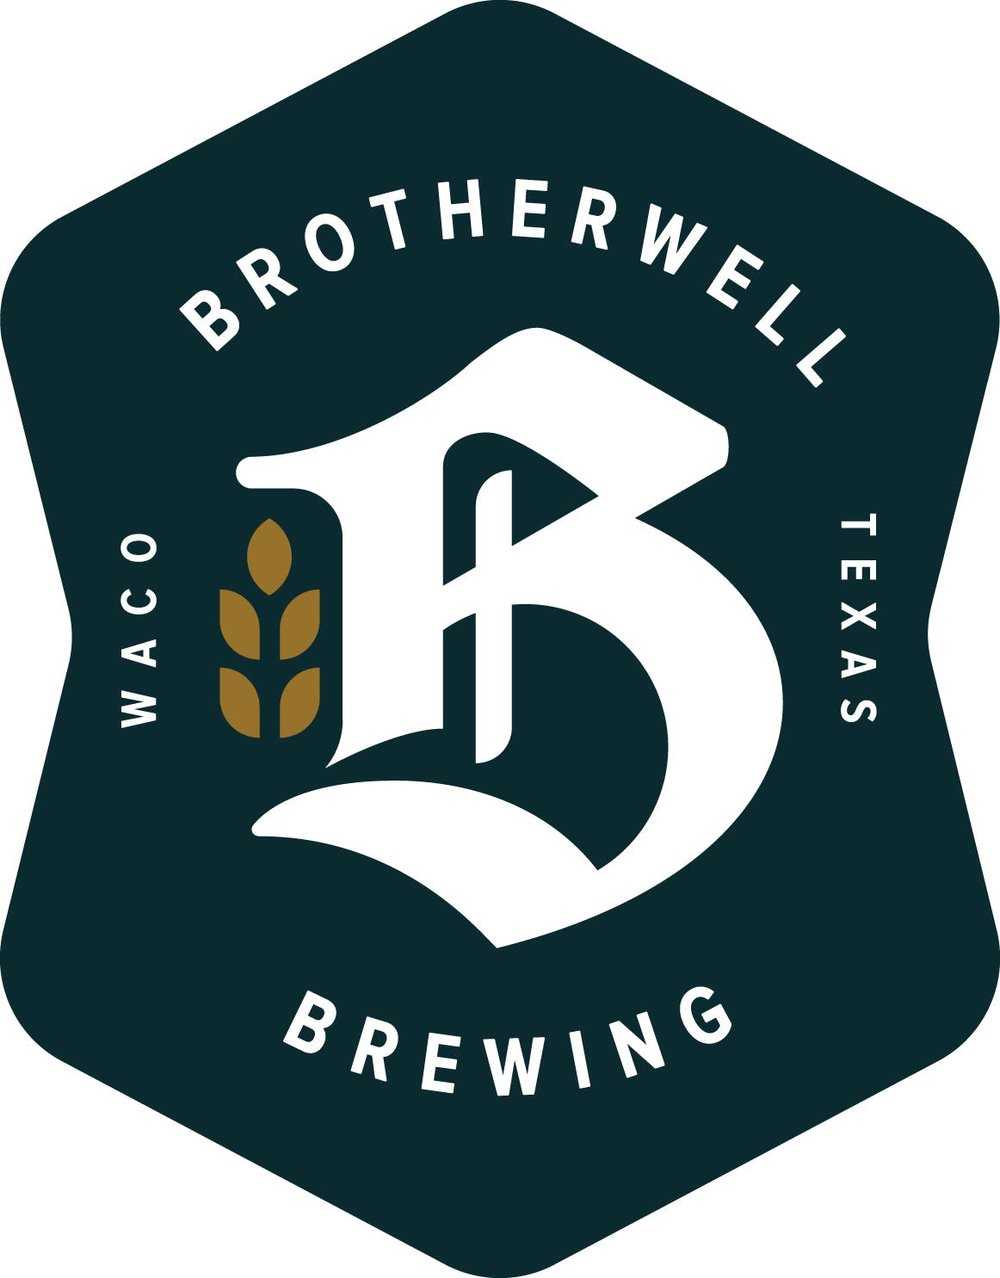 brotherwell small.jpg